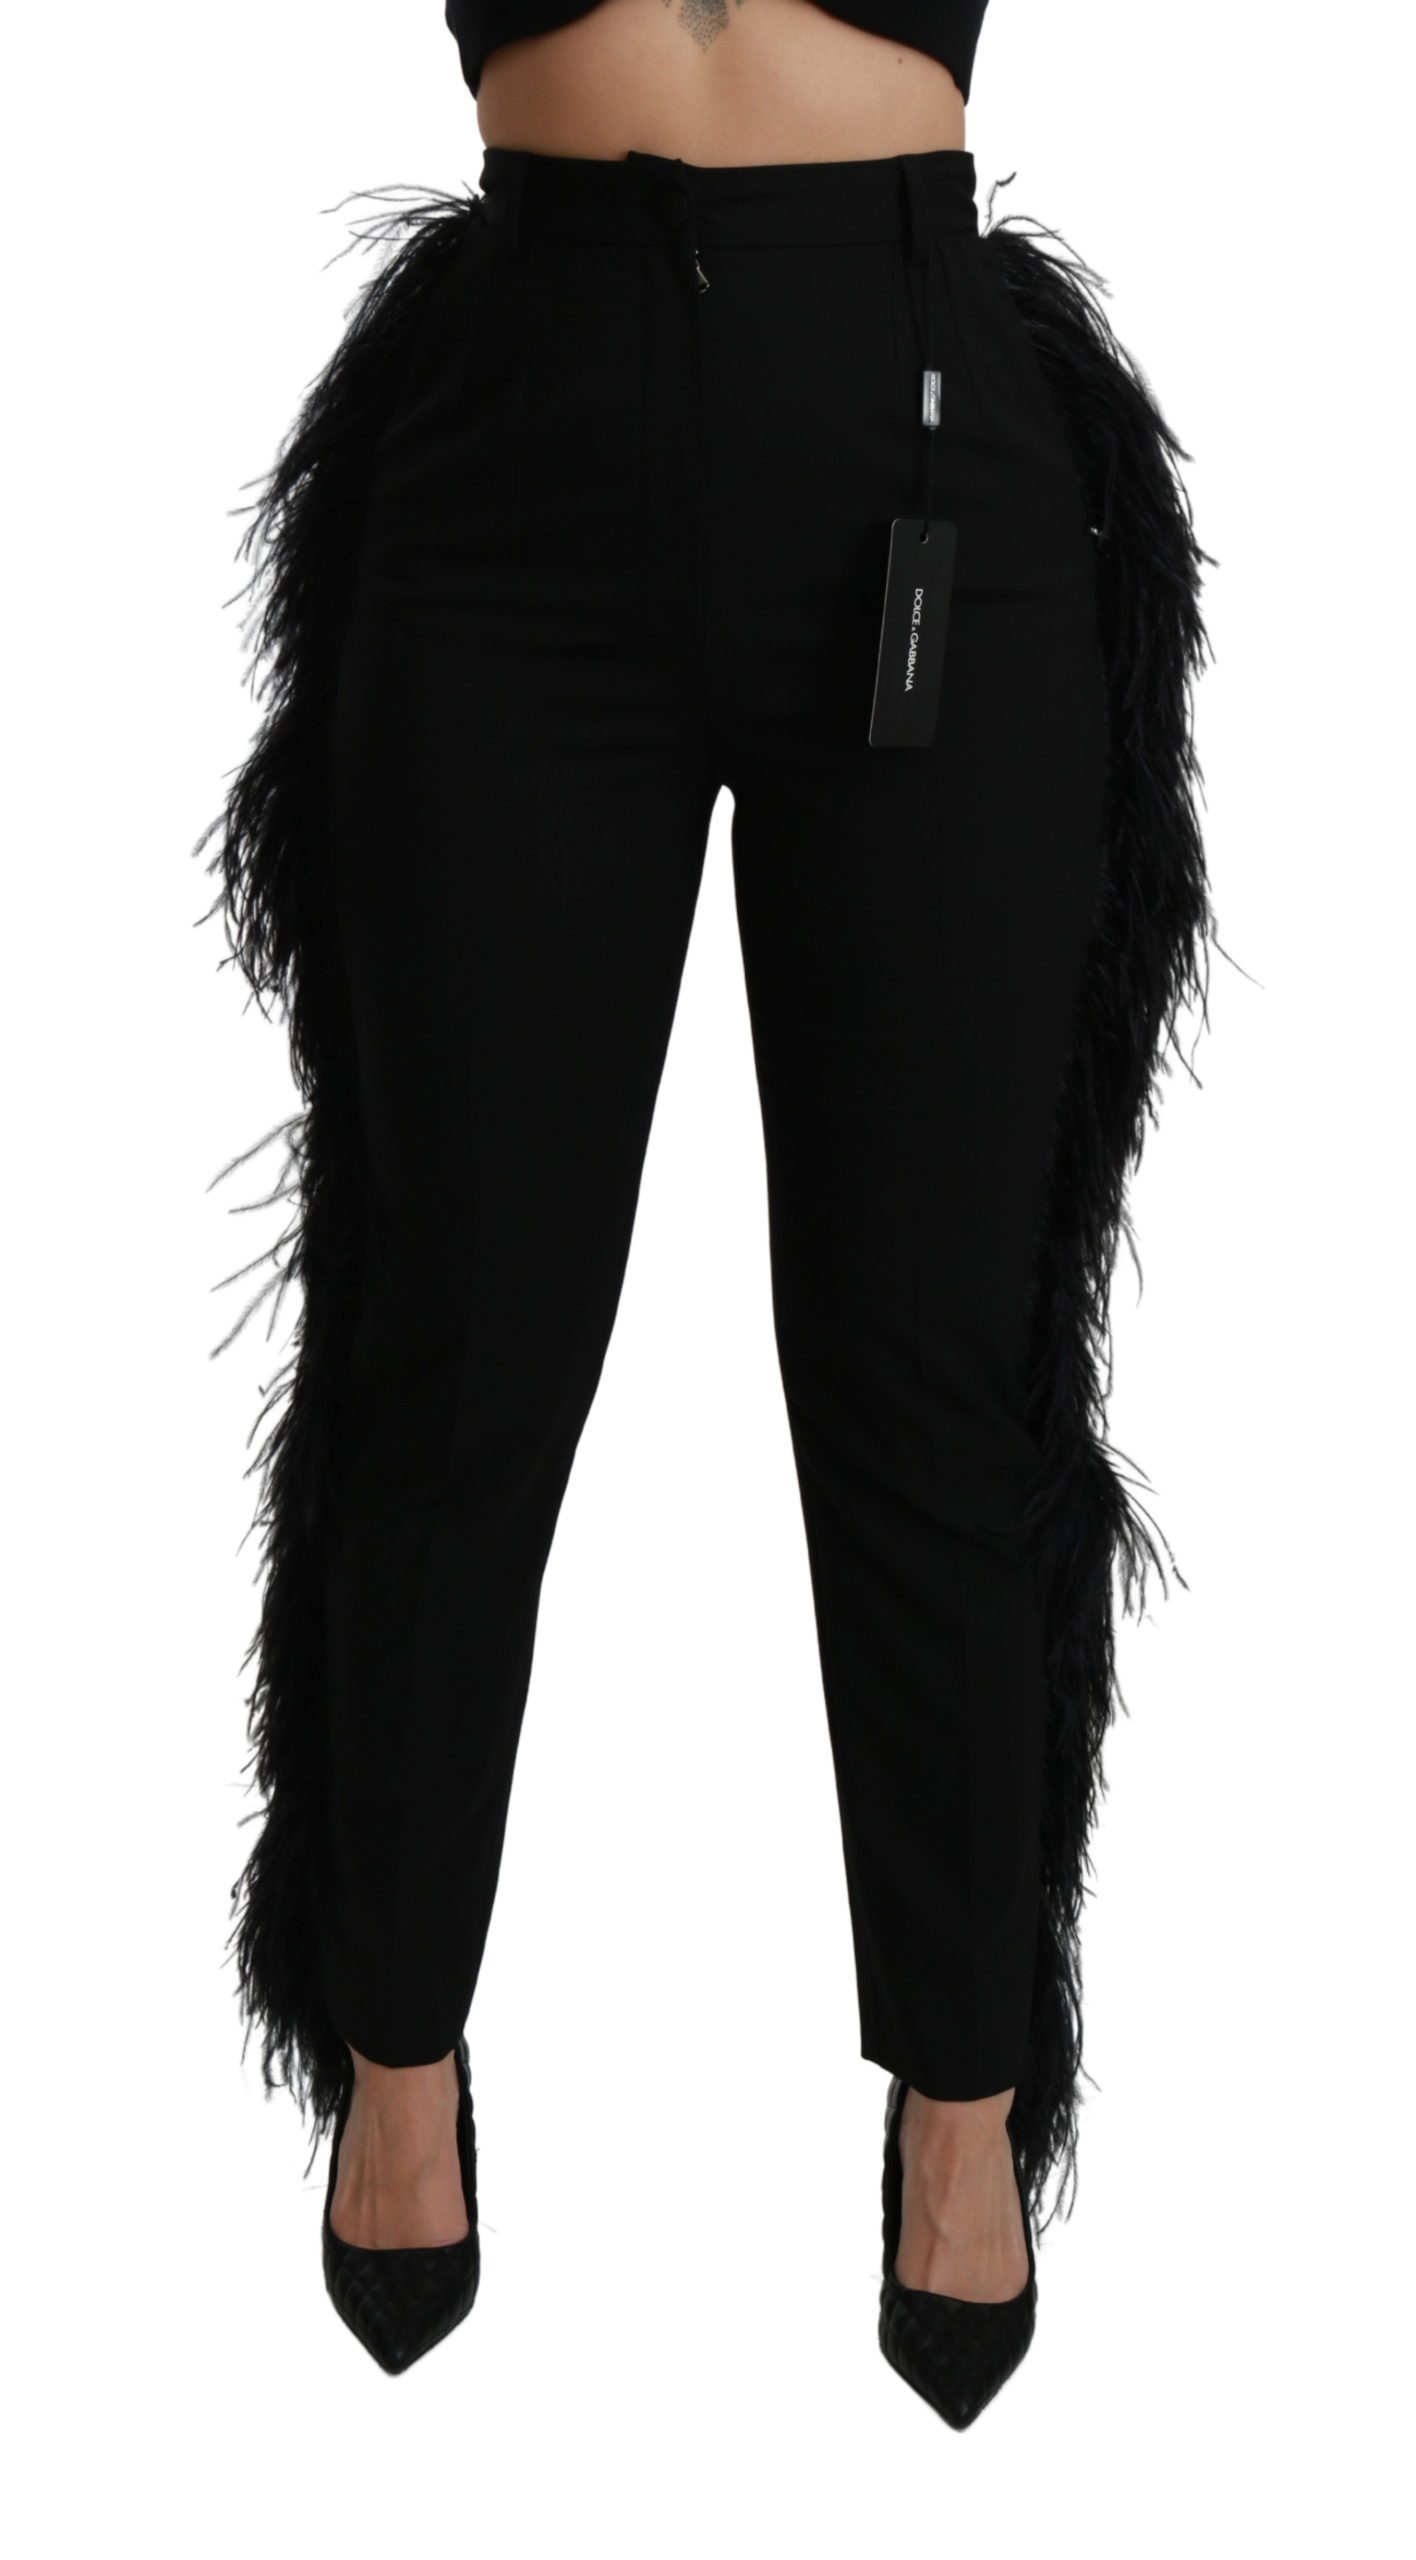 Dolce & Gabbana Feather Straight High Waist Trouser Black PAN70953 - IT40|S